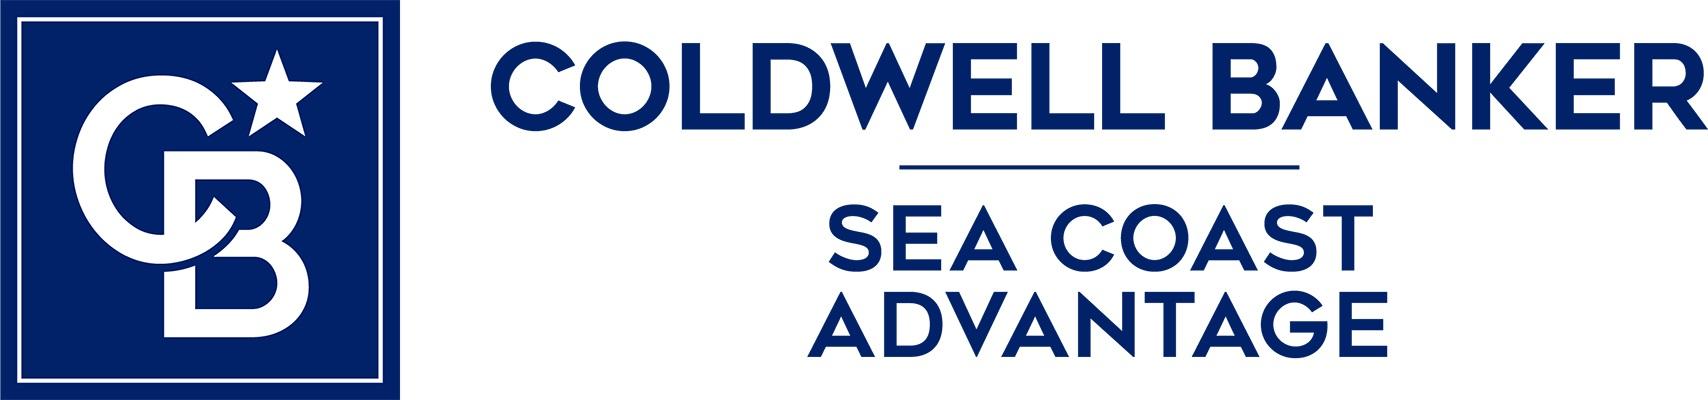 Sherwood Strickland - Coldwell Banker Sea Coast Advantage Realty Logo